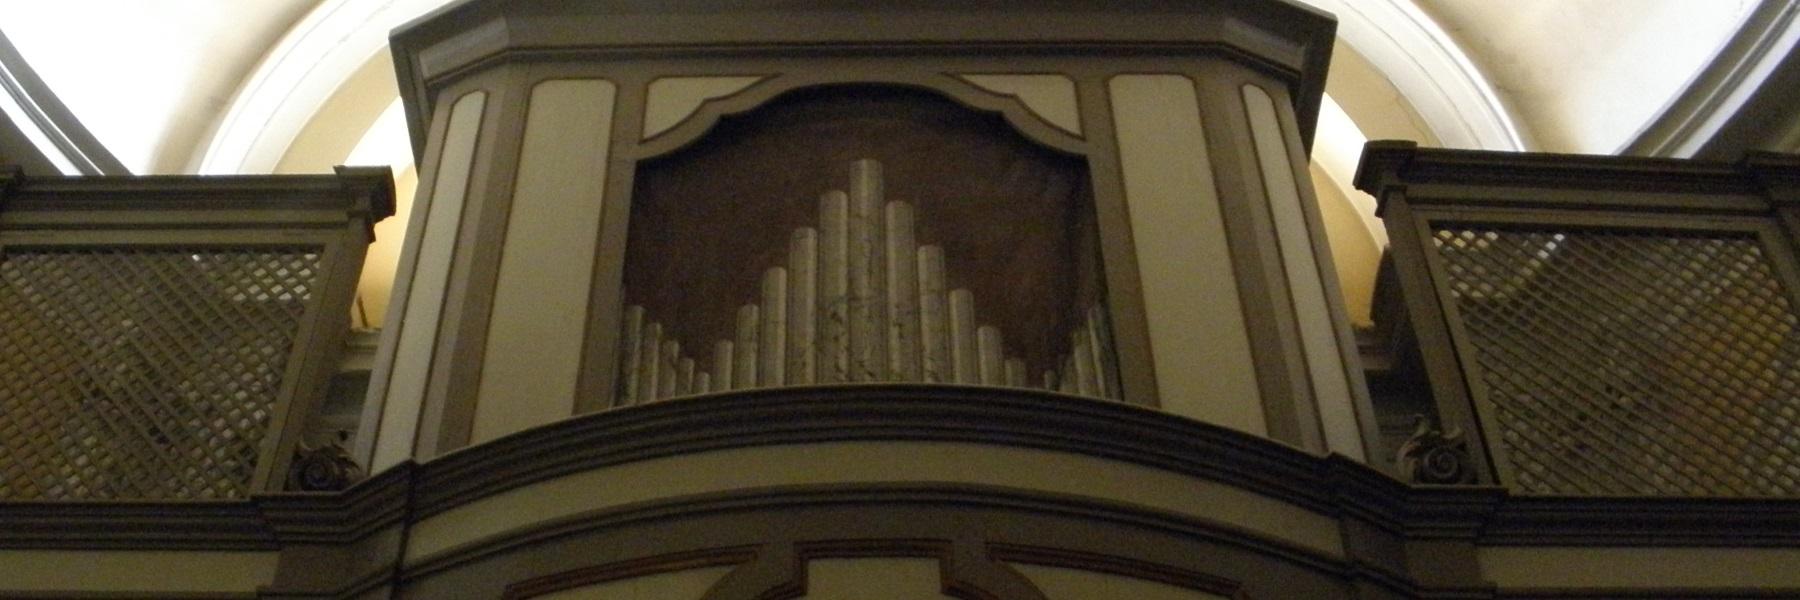 Callido Organ - Suffragio Church